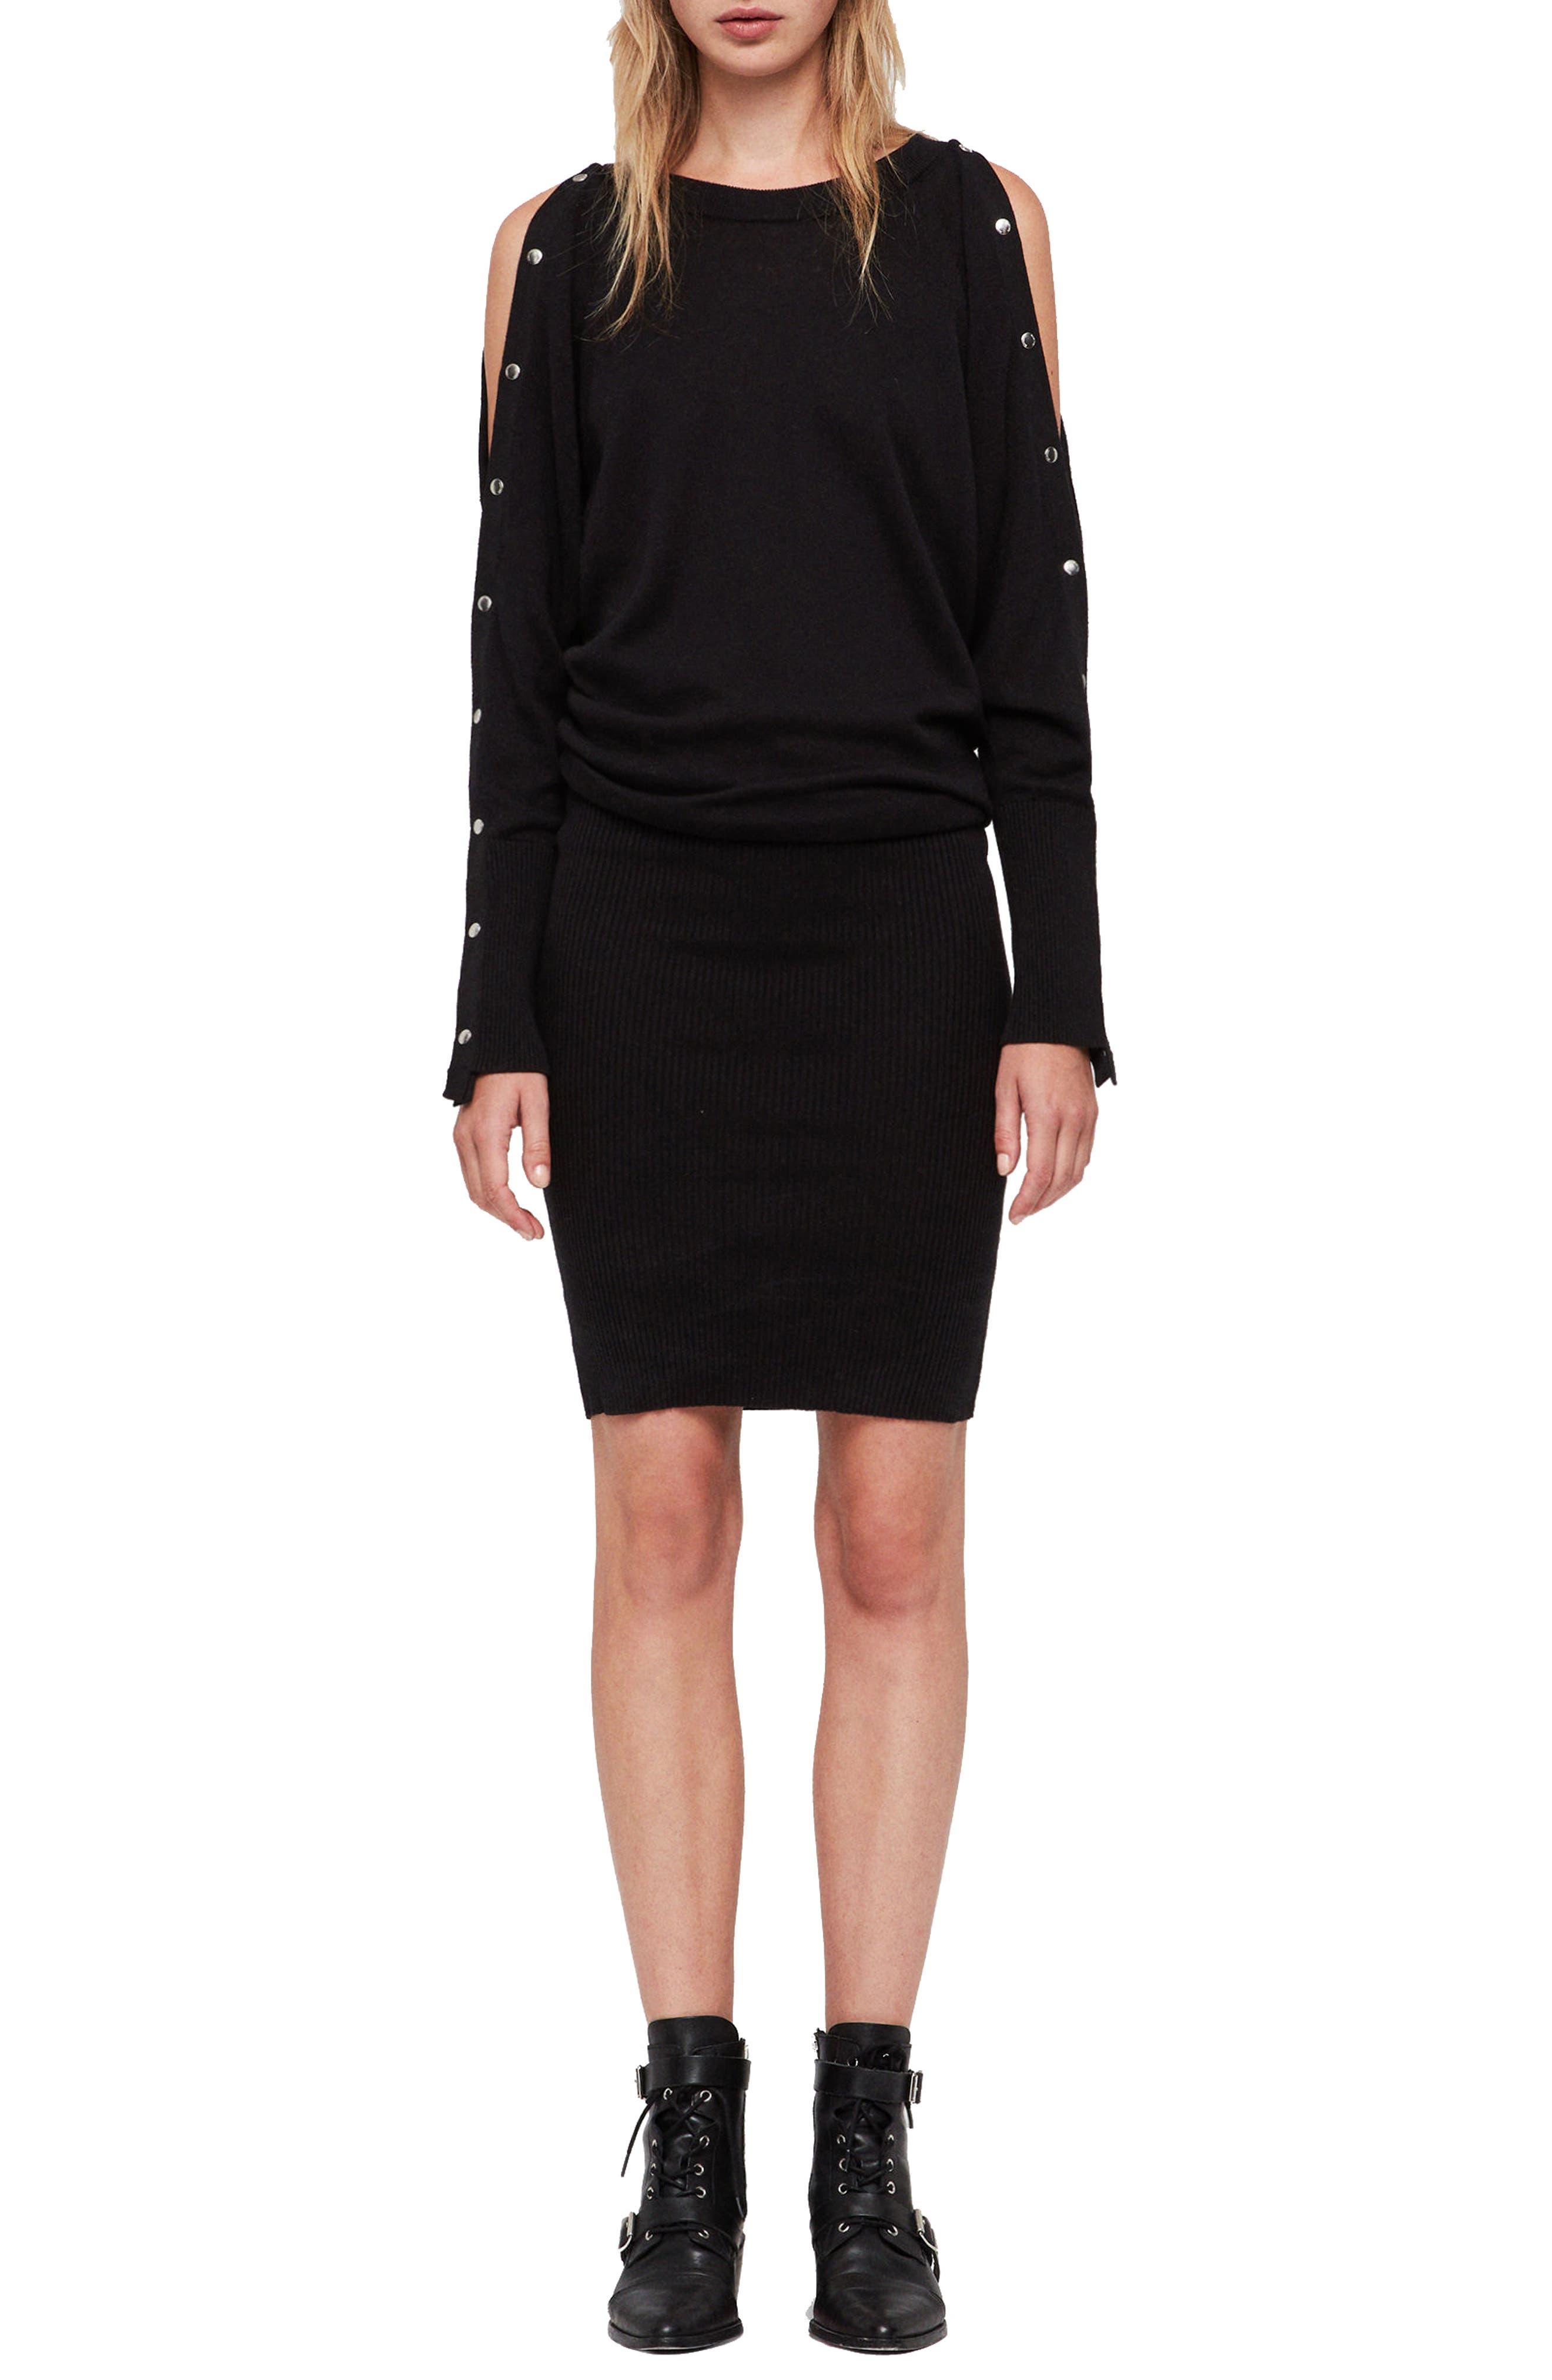 ALLSAINTS Suzie Snap Sleeve Sweater Dress, Main, color, 001